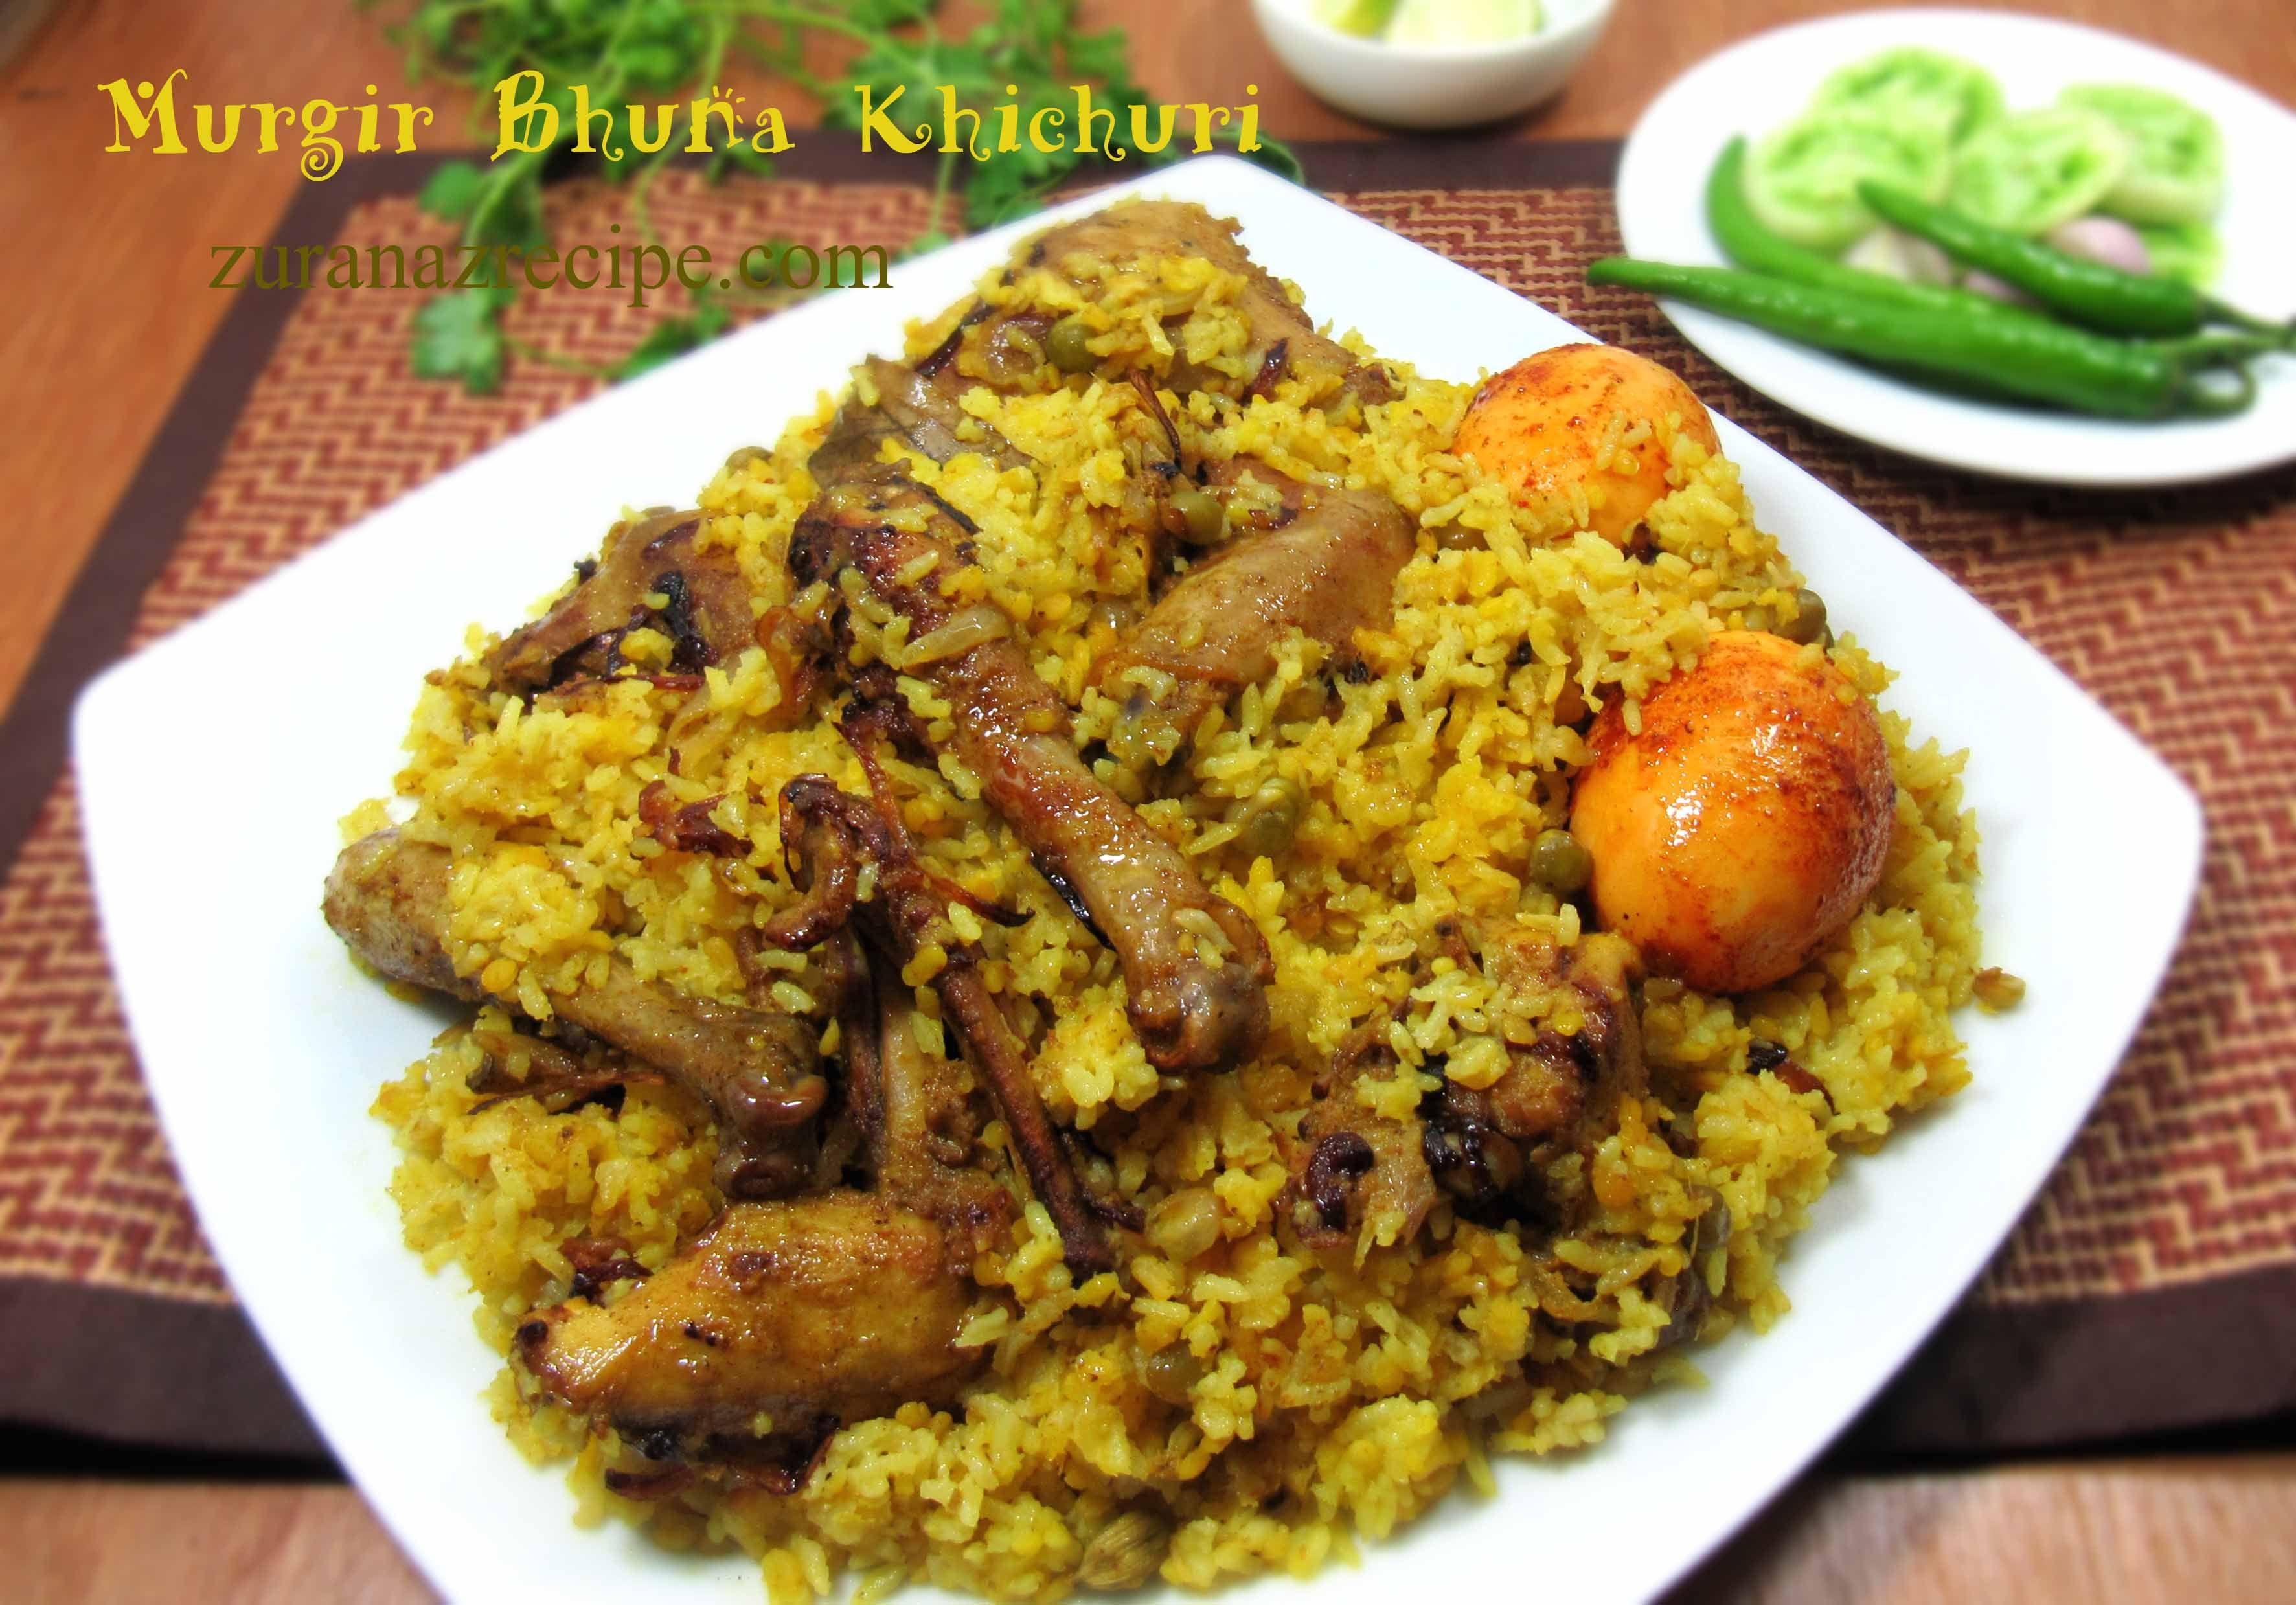 bfeba7deaae4d Murgir Bhuna Khichuri Chicken Khichuri